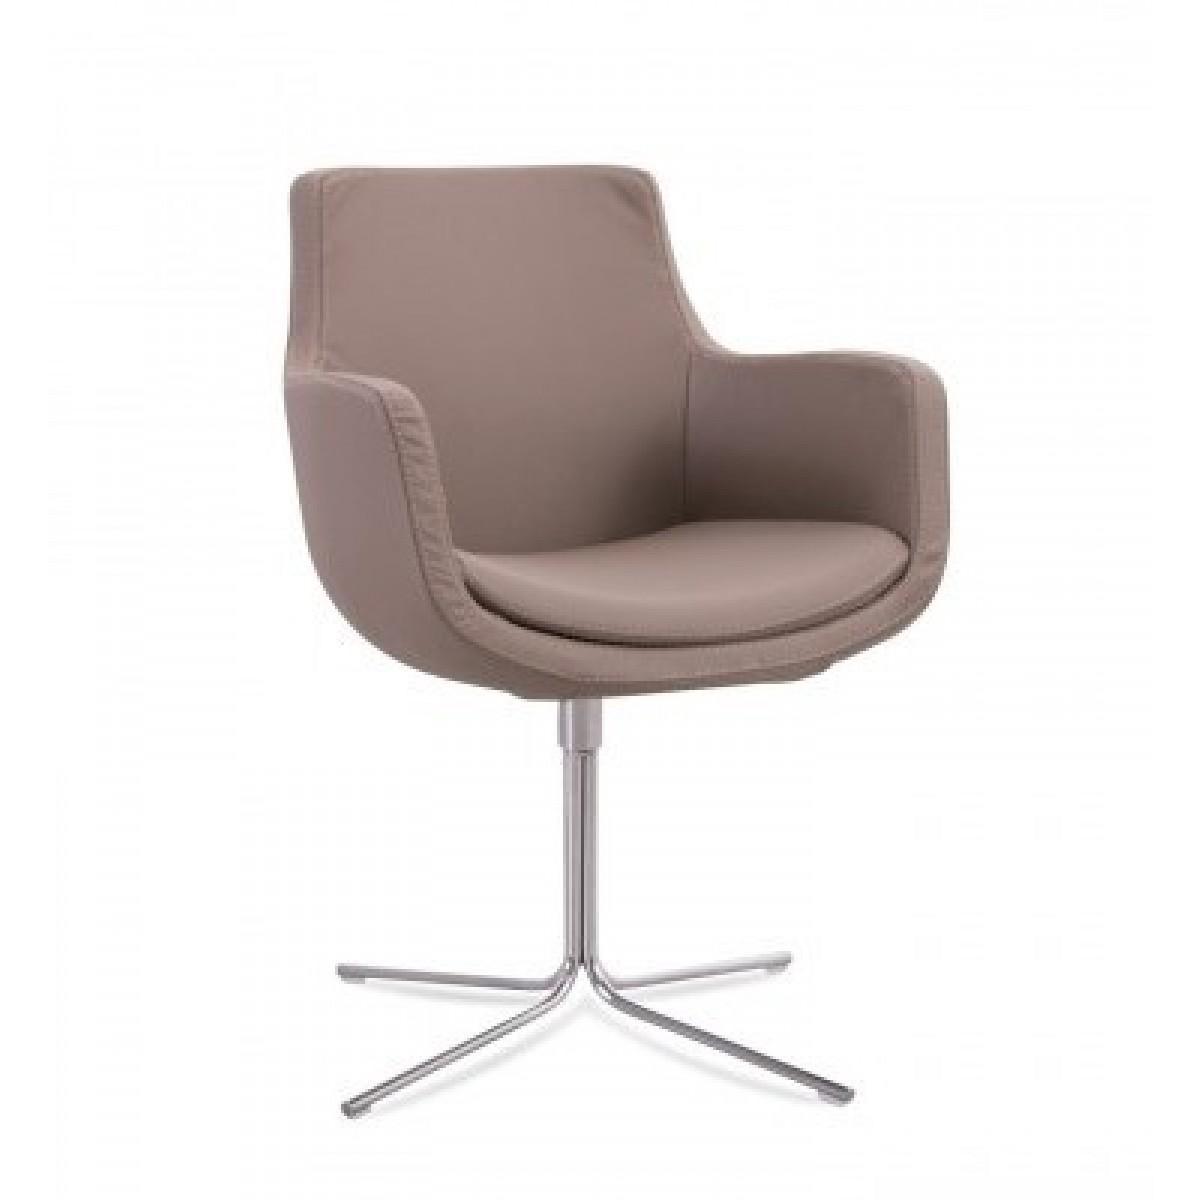 annabel stuhl spinnen fuss i live design preisg nstig online moebel kaufen. Black Bedroom Furniture Sets. Home Design Ideas